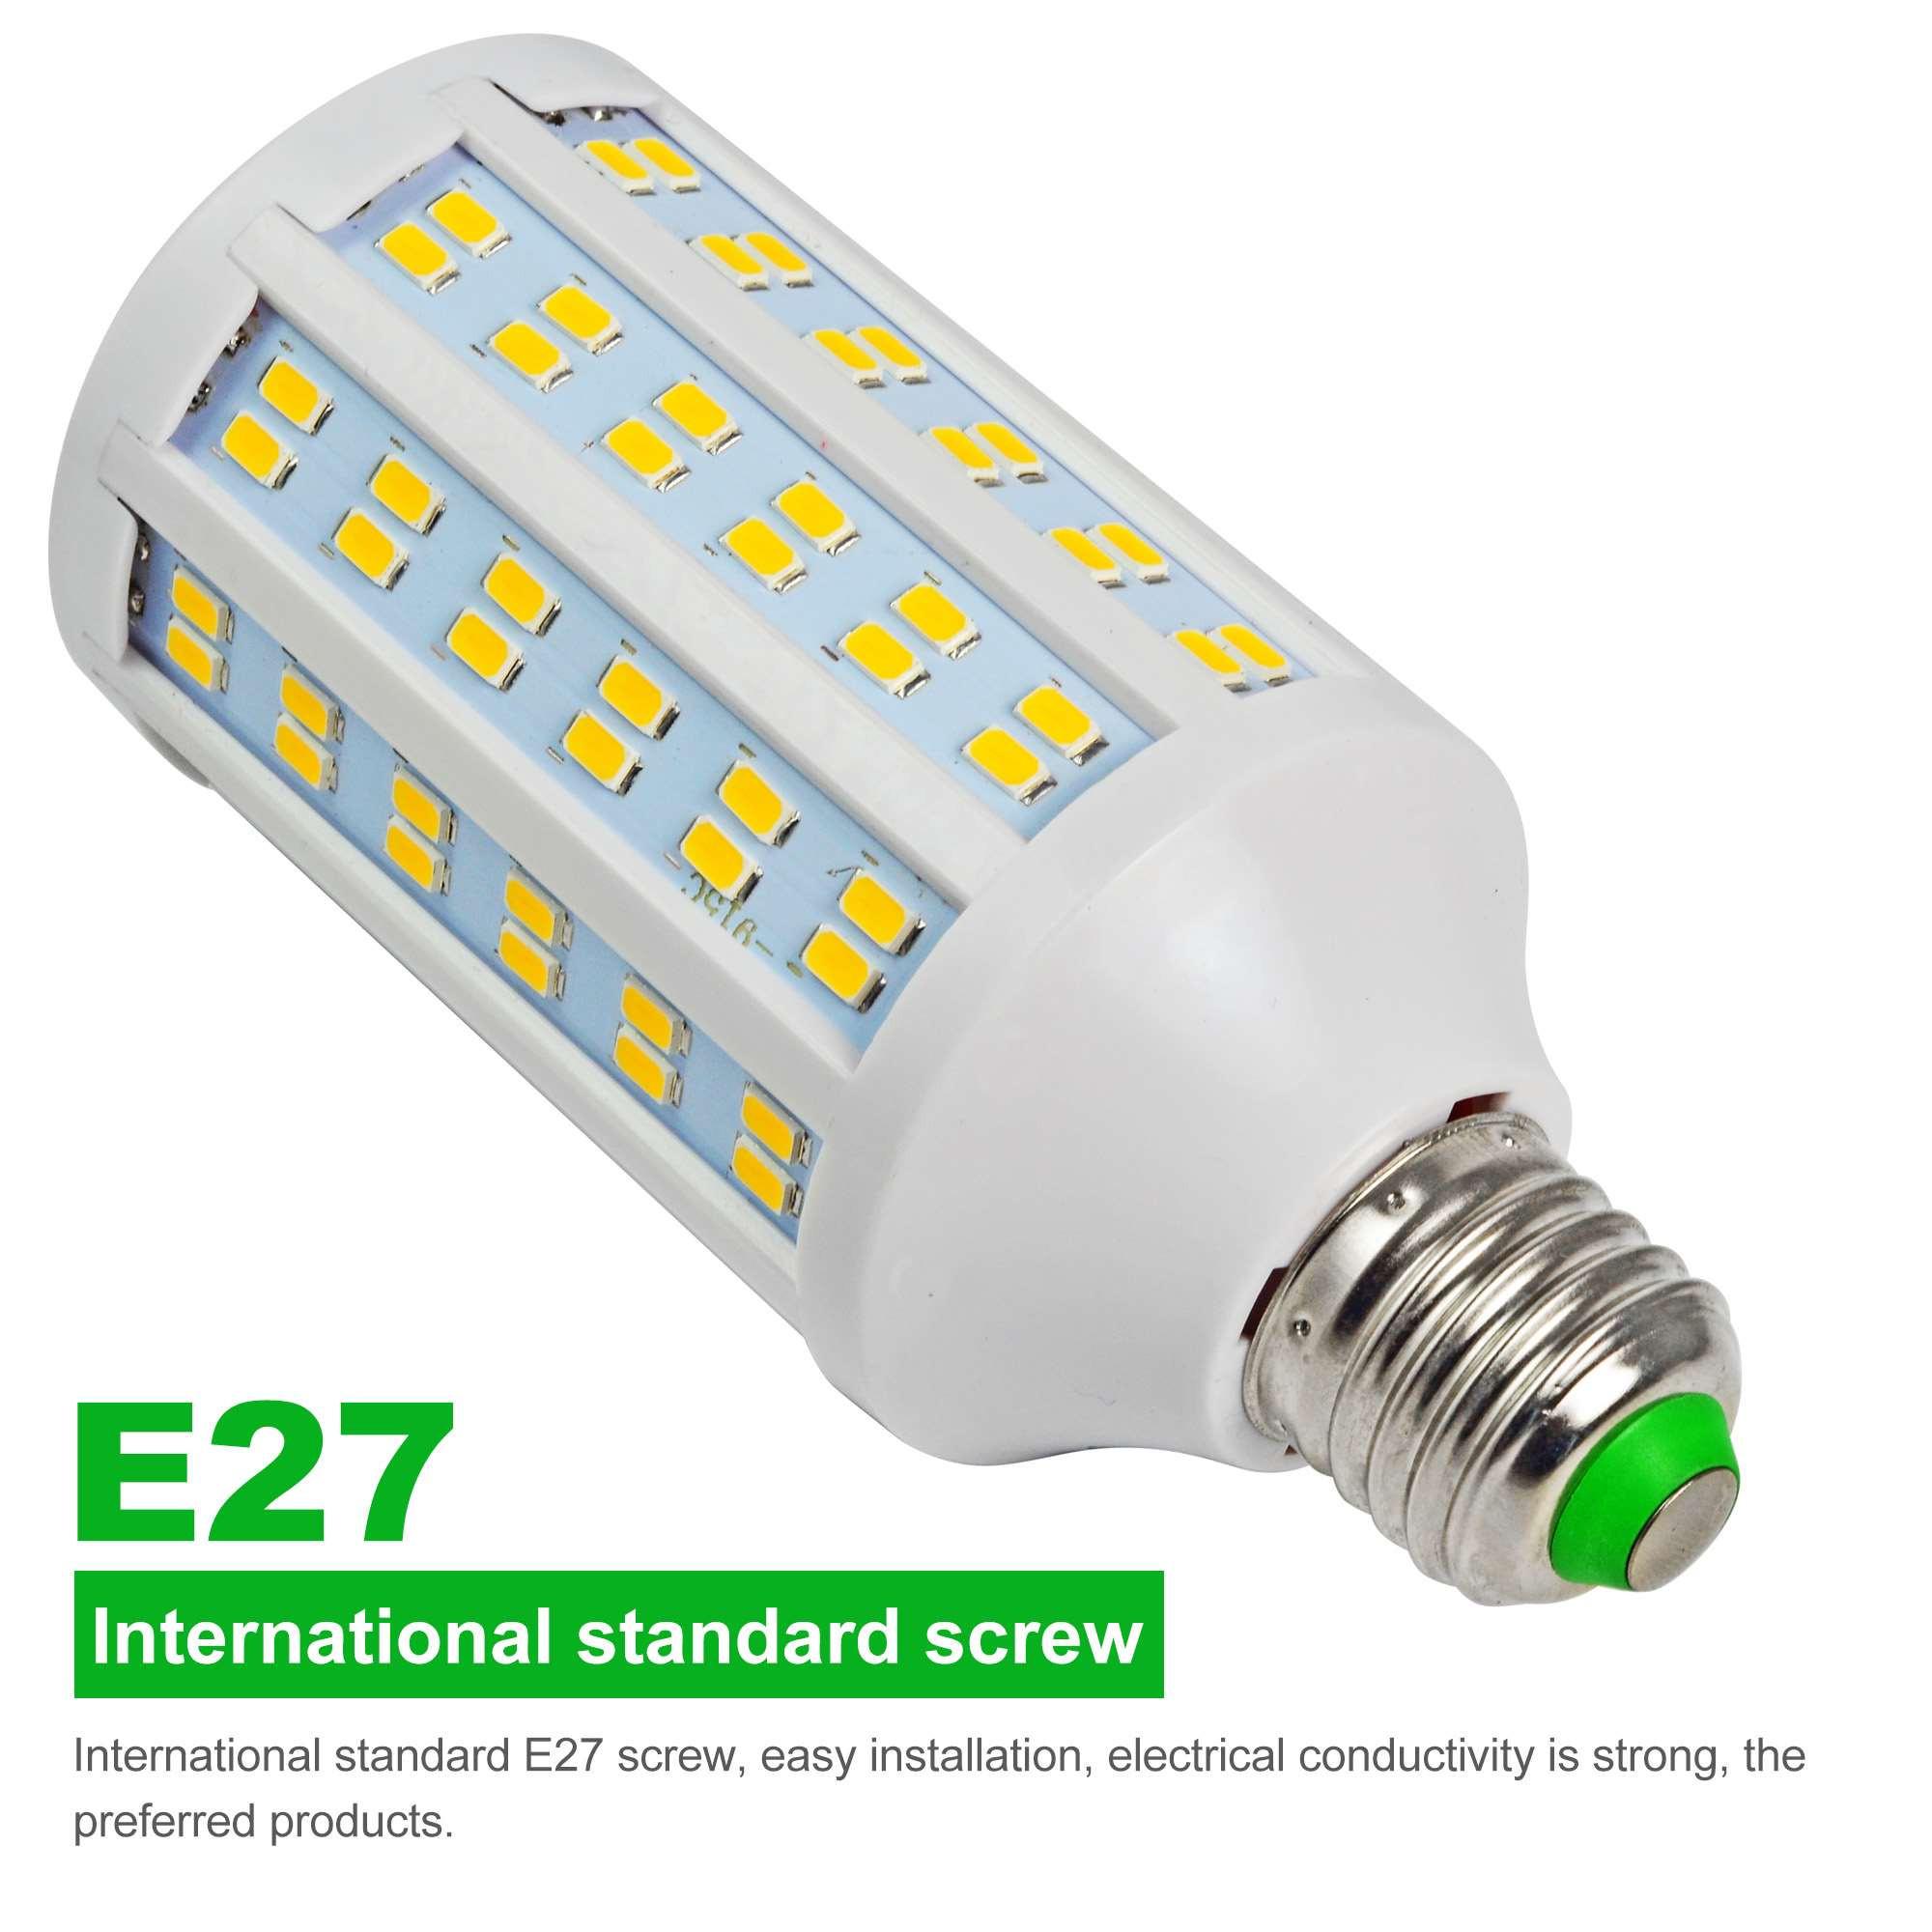 e27 20w led corn light 144x 5730 smd led bulb lamp ac 85 265v in warm white energy saving light. Black Bedroom Furniture Sets. Home Design Ideas